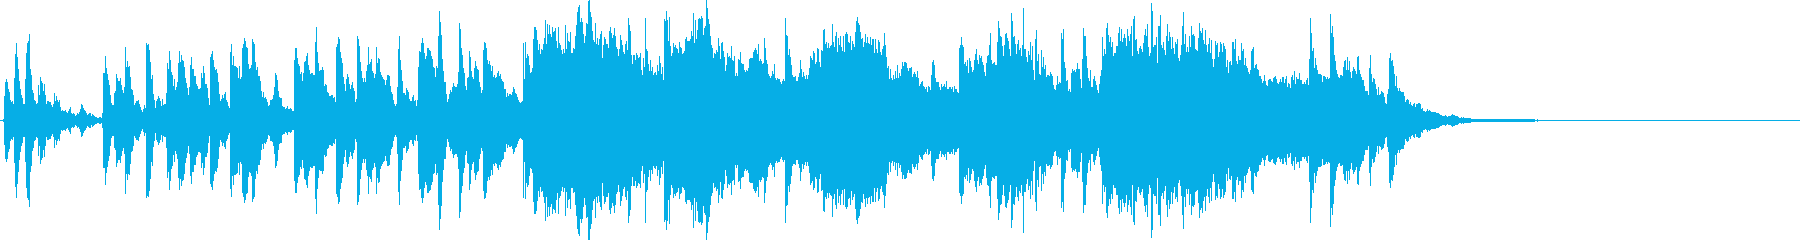 CM向けの尺で製作しました。ピアノソロ…の再生済みの波形